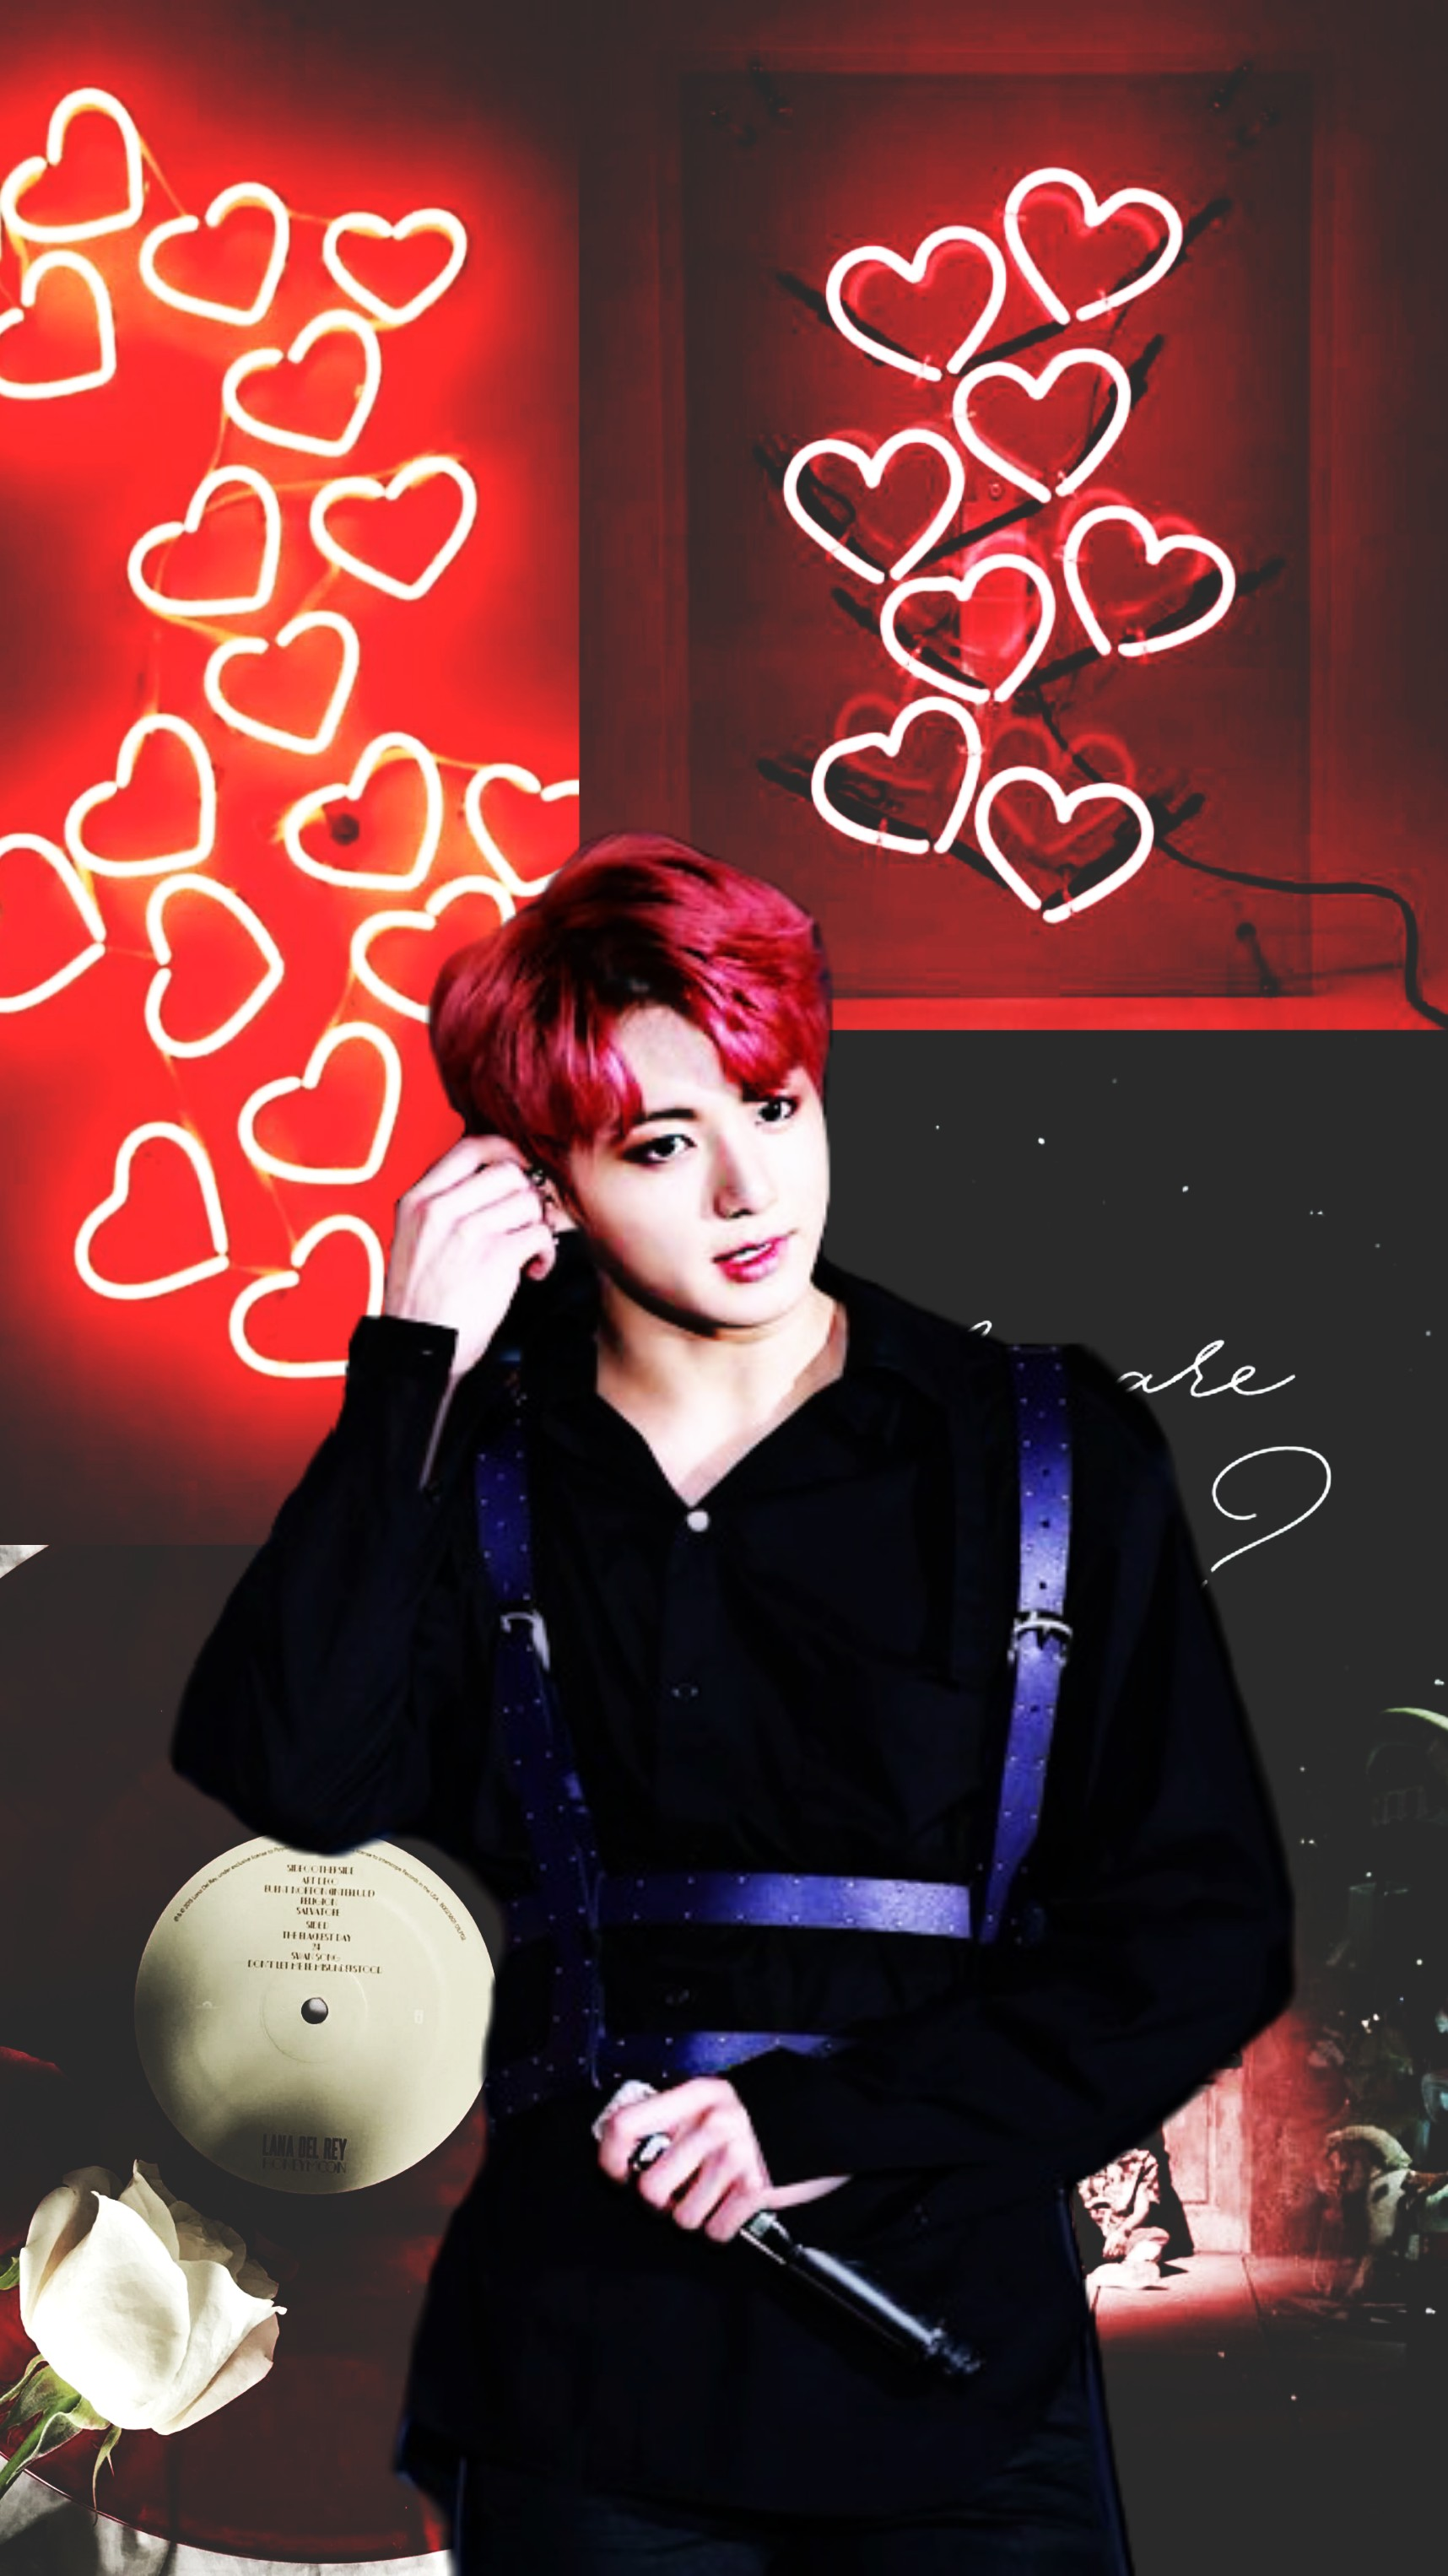 freetoedit jungkook jeon bts bts aesthetic you